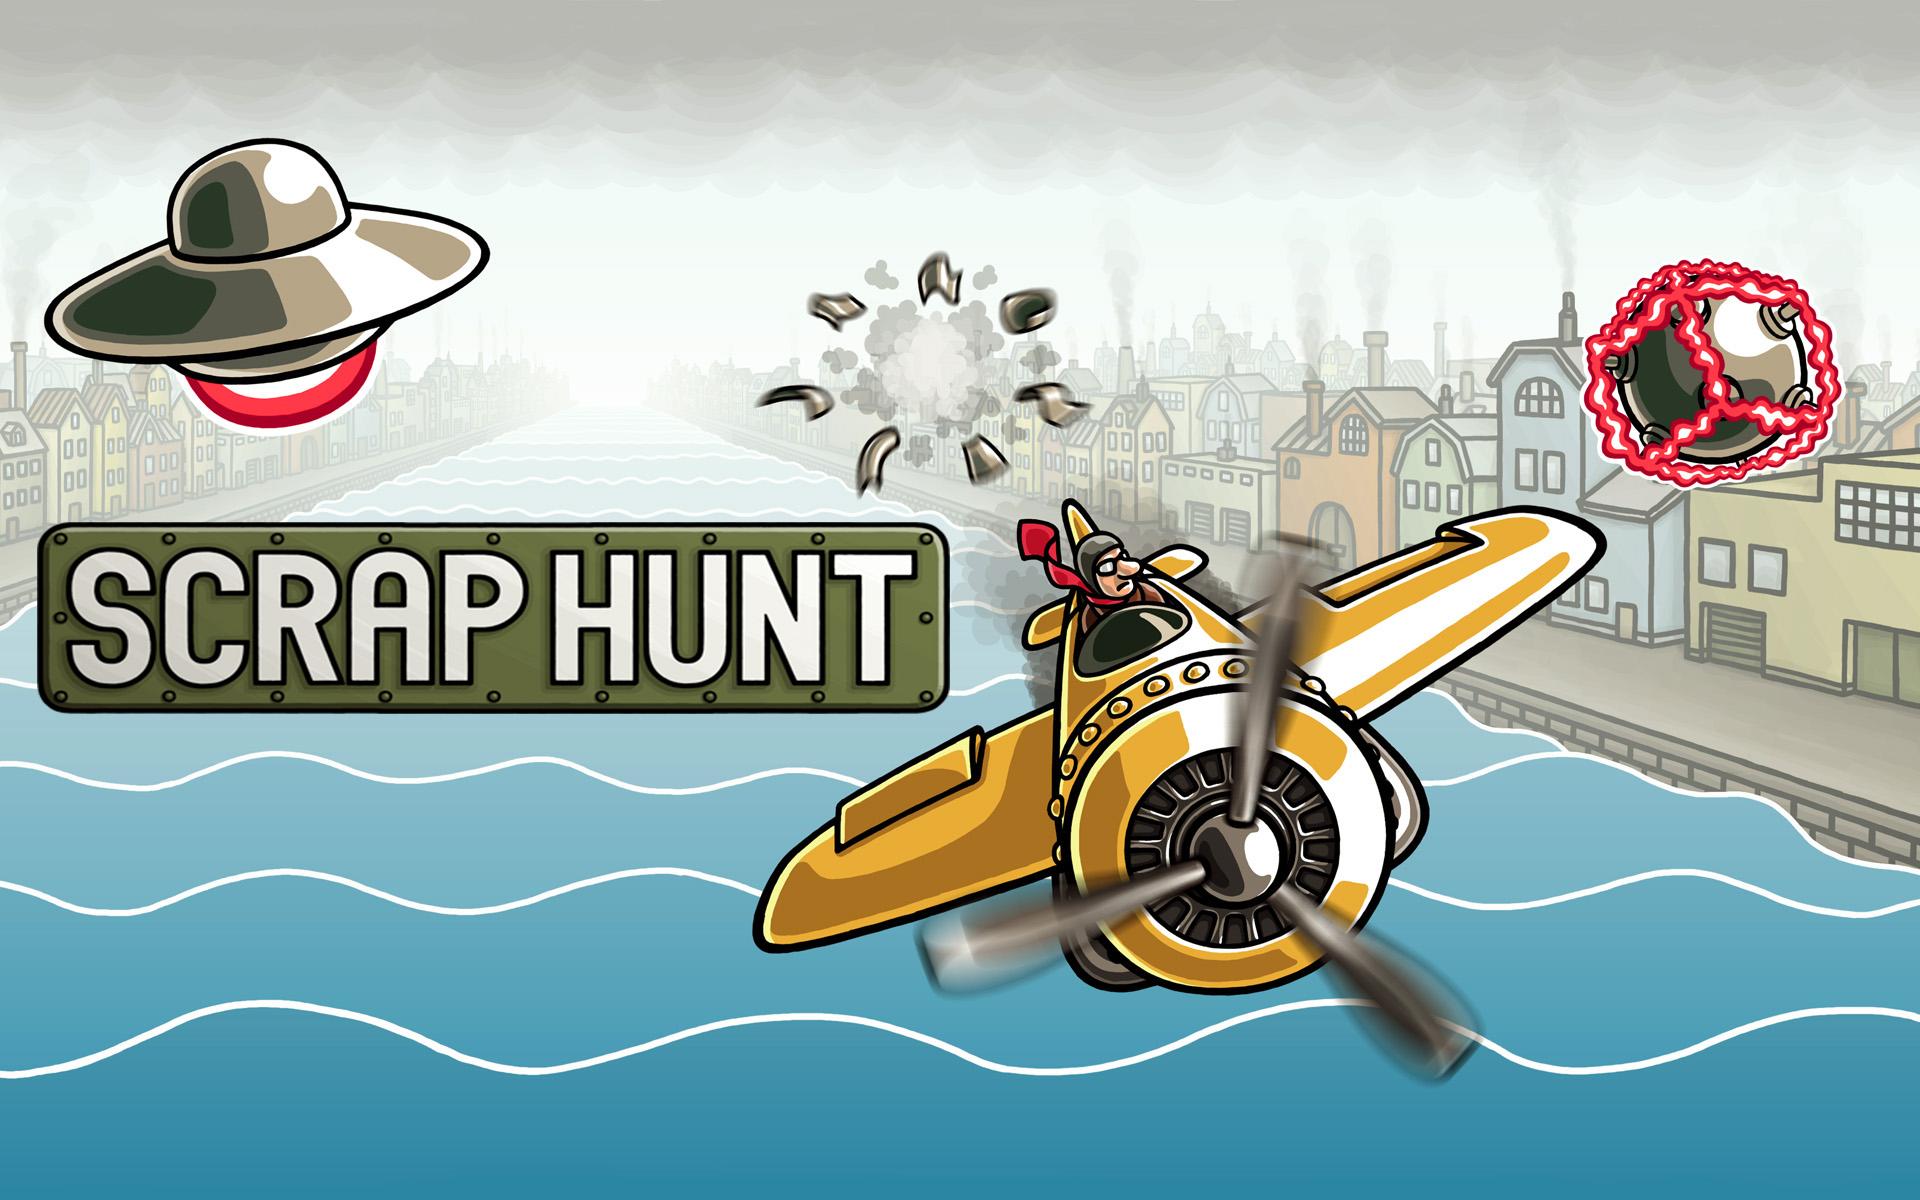 Scrap Hunt